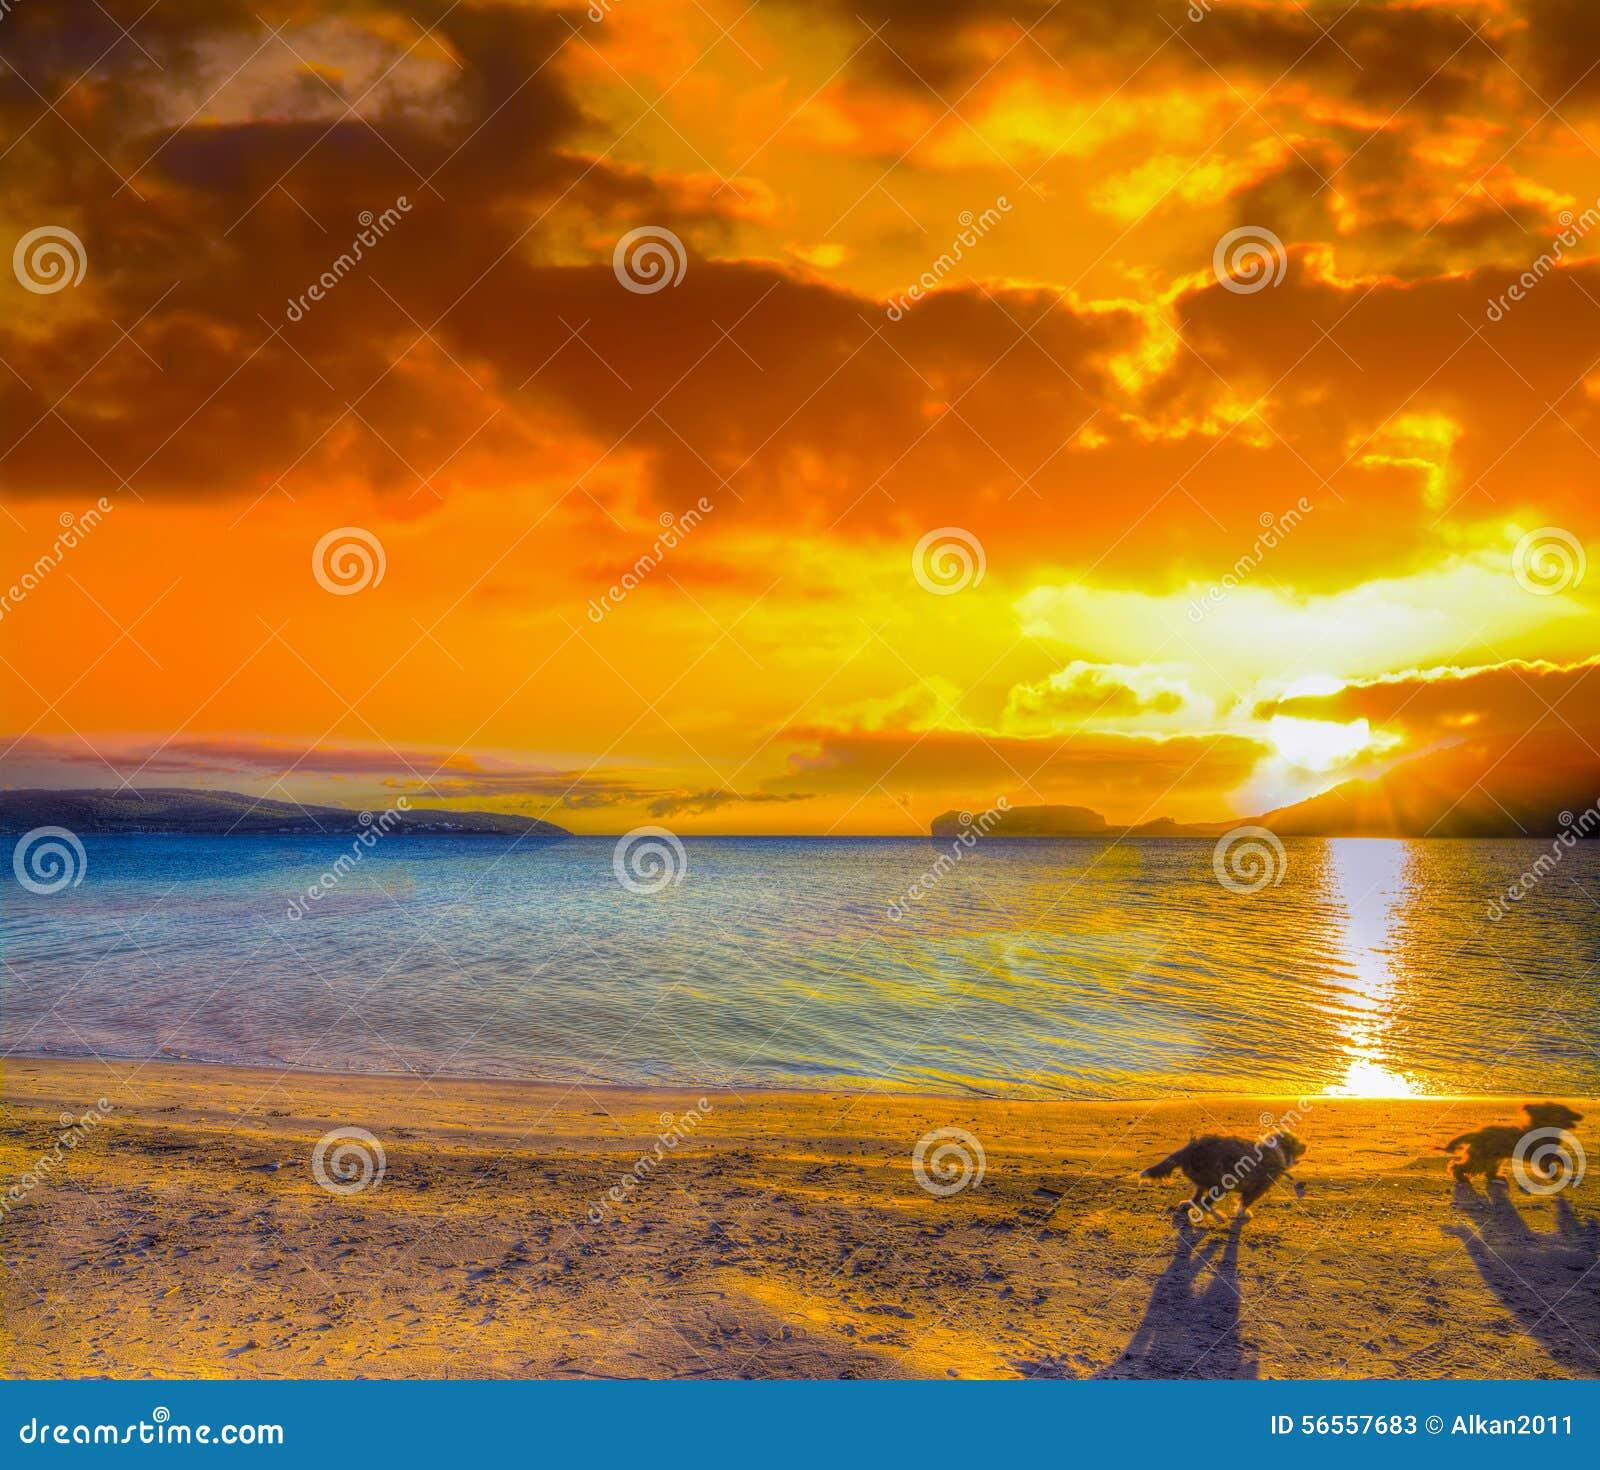 Download Δύο μικρά σκυλιά που τρέχουν στην παραλία στο ηλιοβασίλεμα Στοκ Εικόνα - εικόνα από dusk, έξυπνο: 56557683